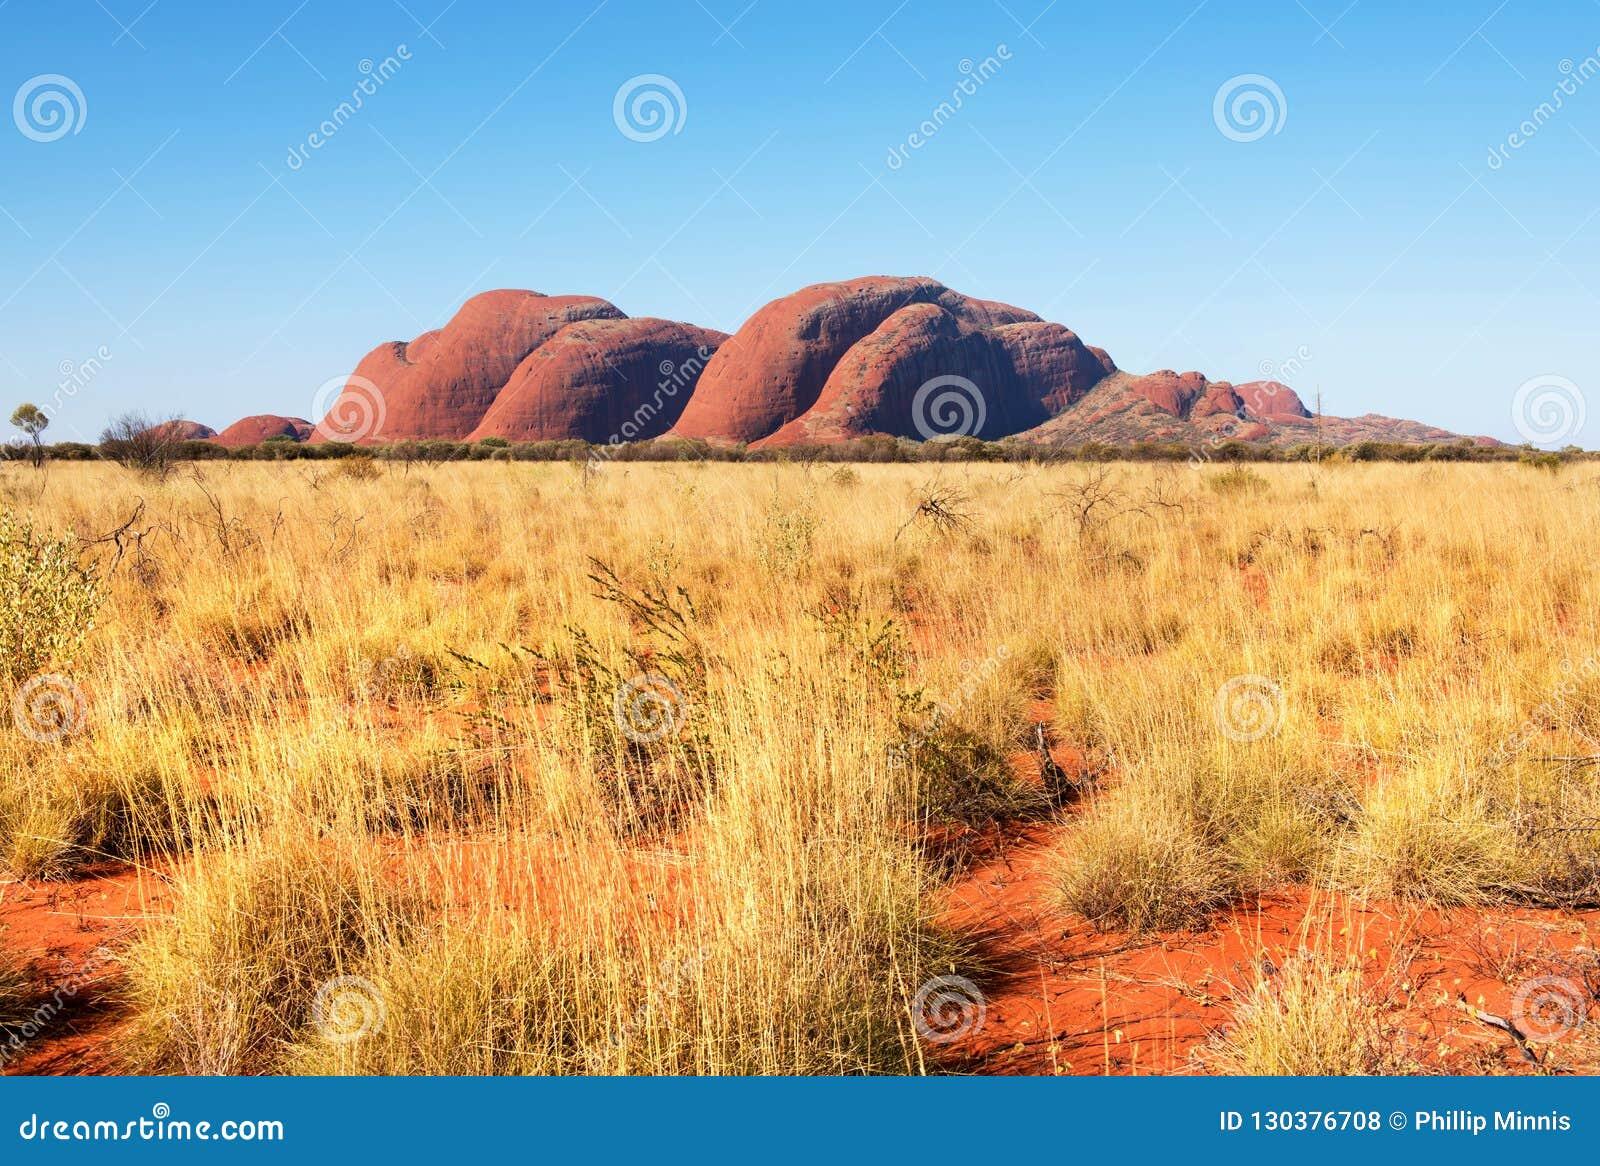 Kat Tjuta Olgas, terytorium północne, Australia